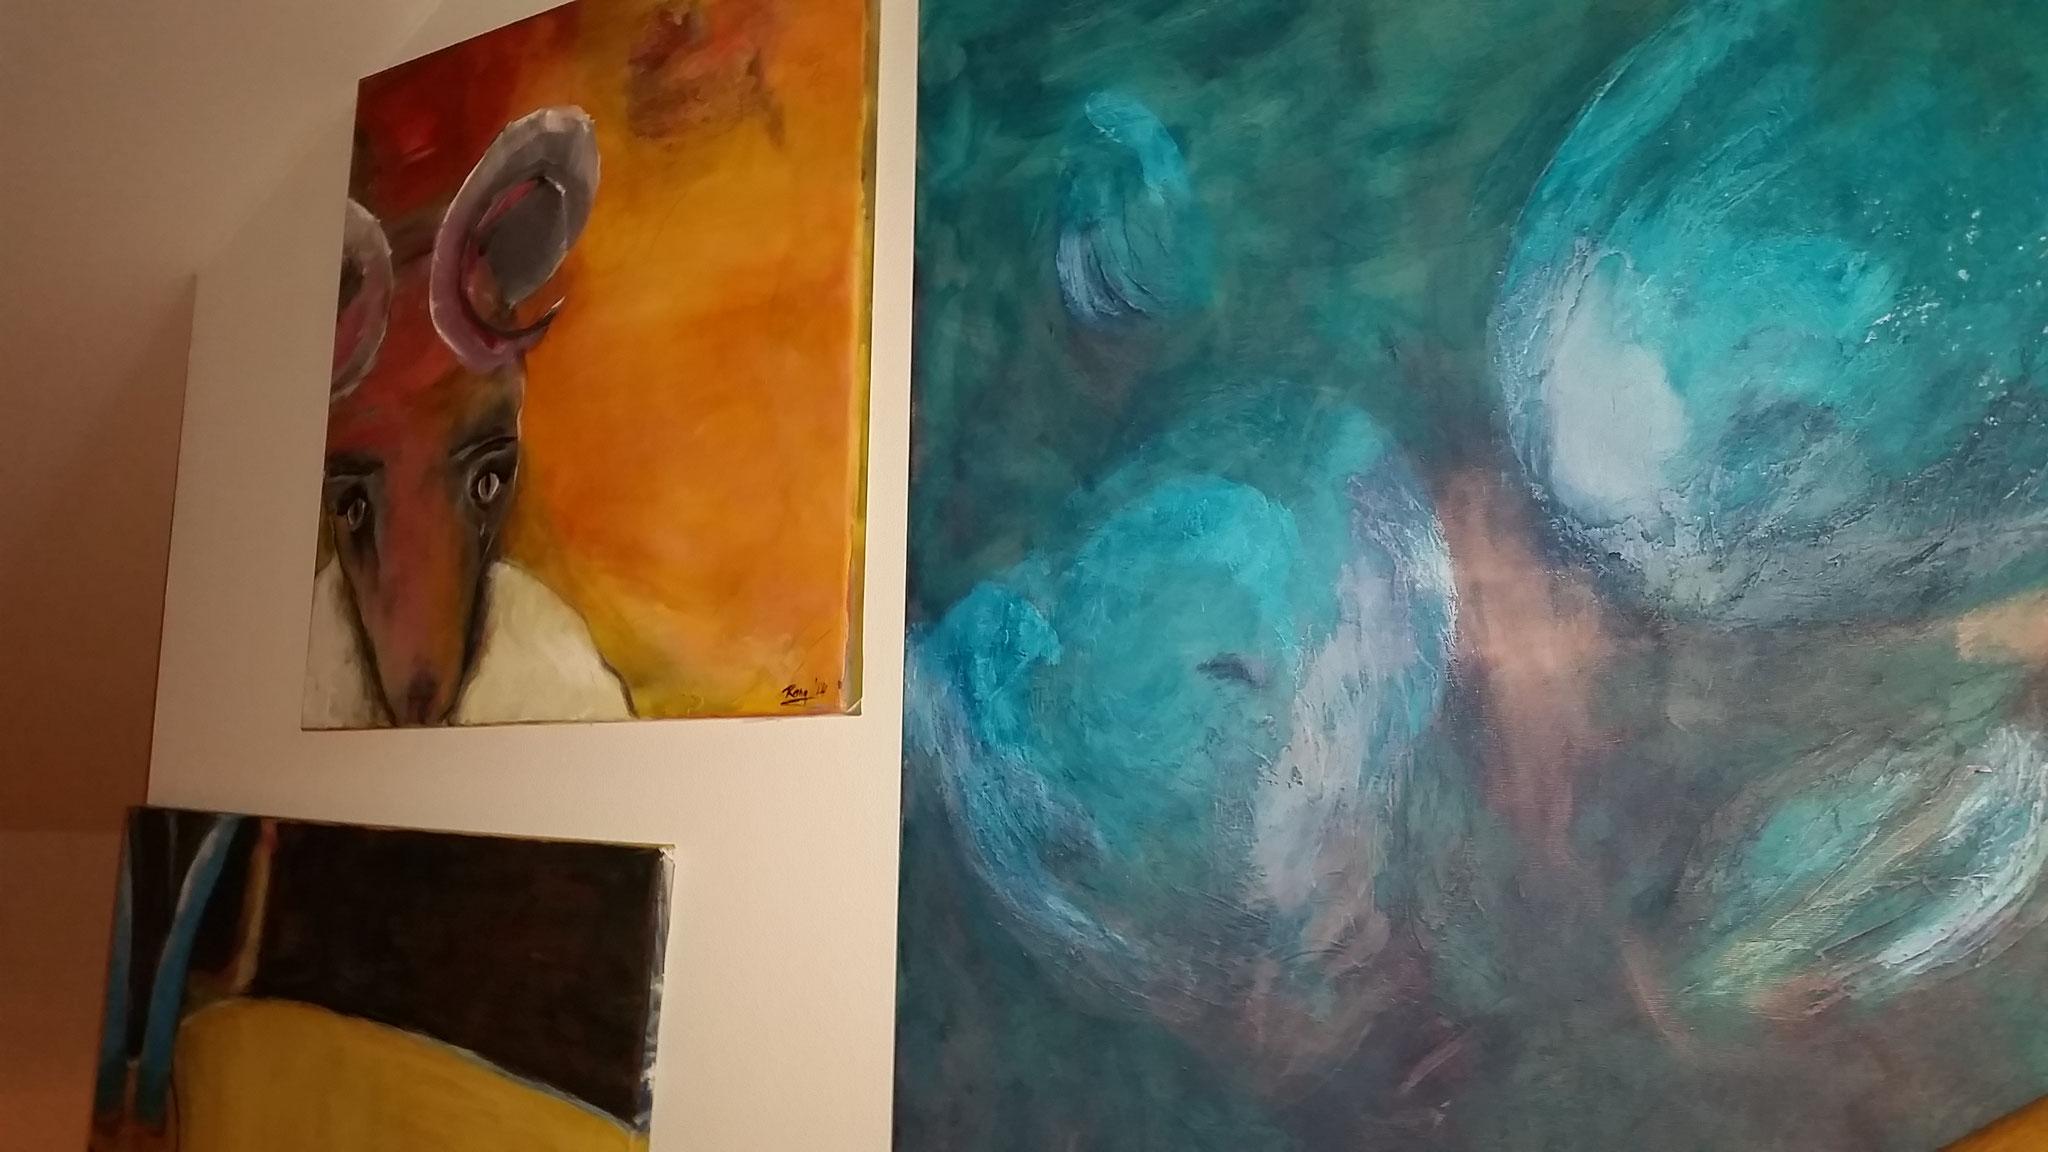 Treppen-Galerie 7, Maler Künstlerin Bozana